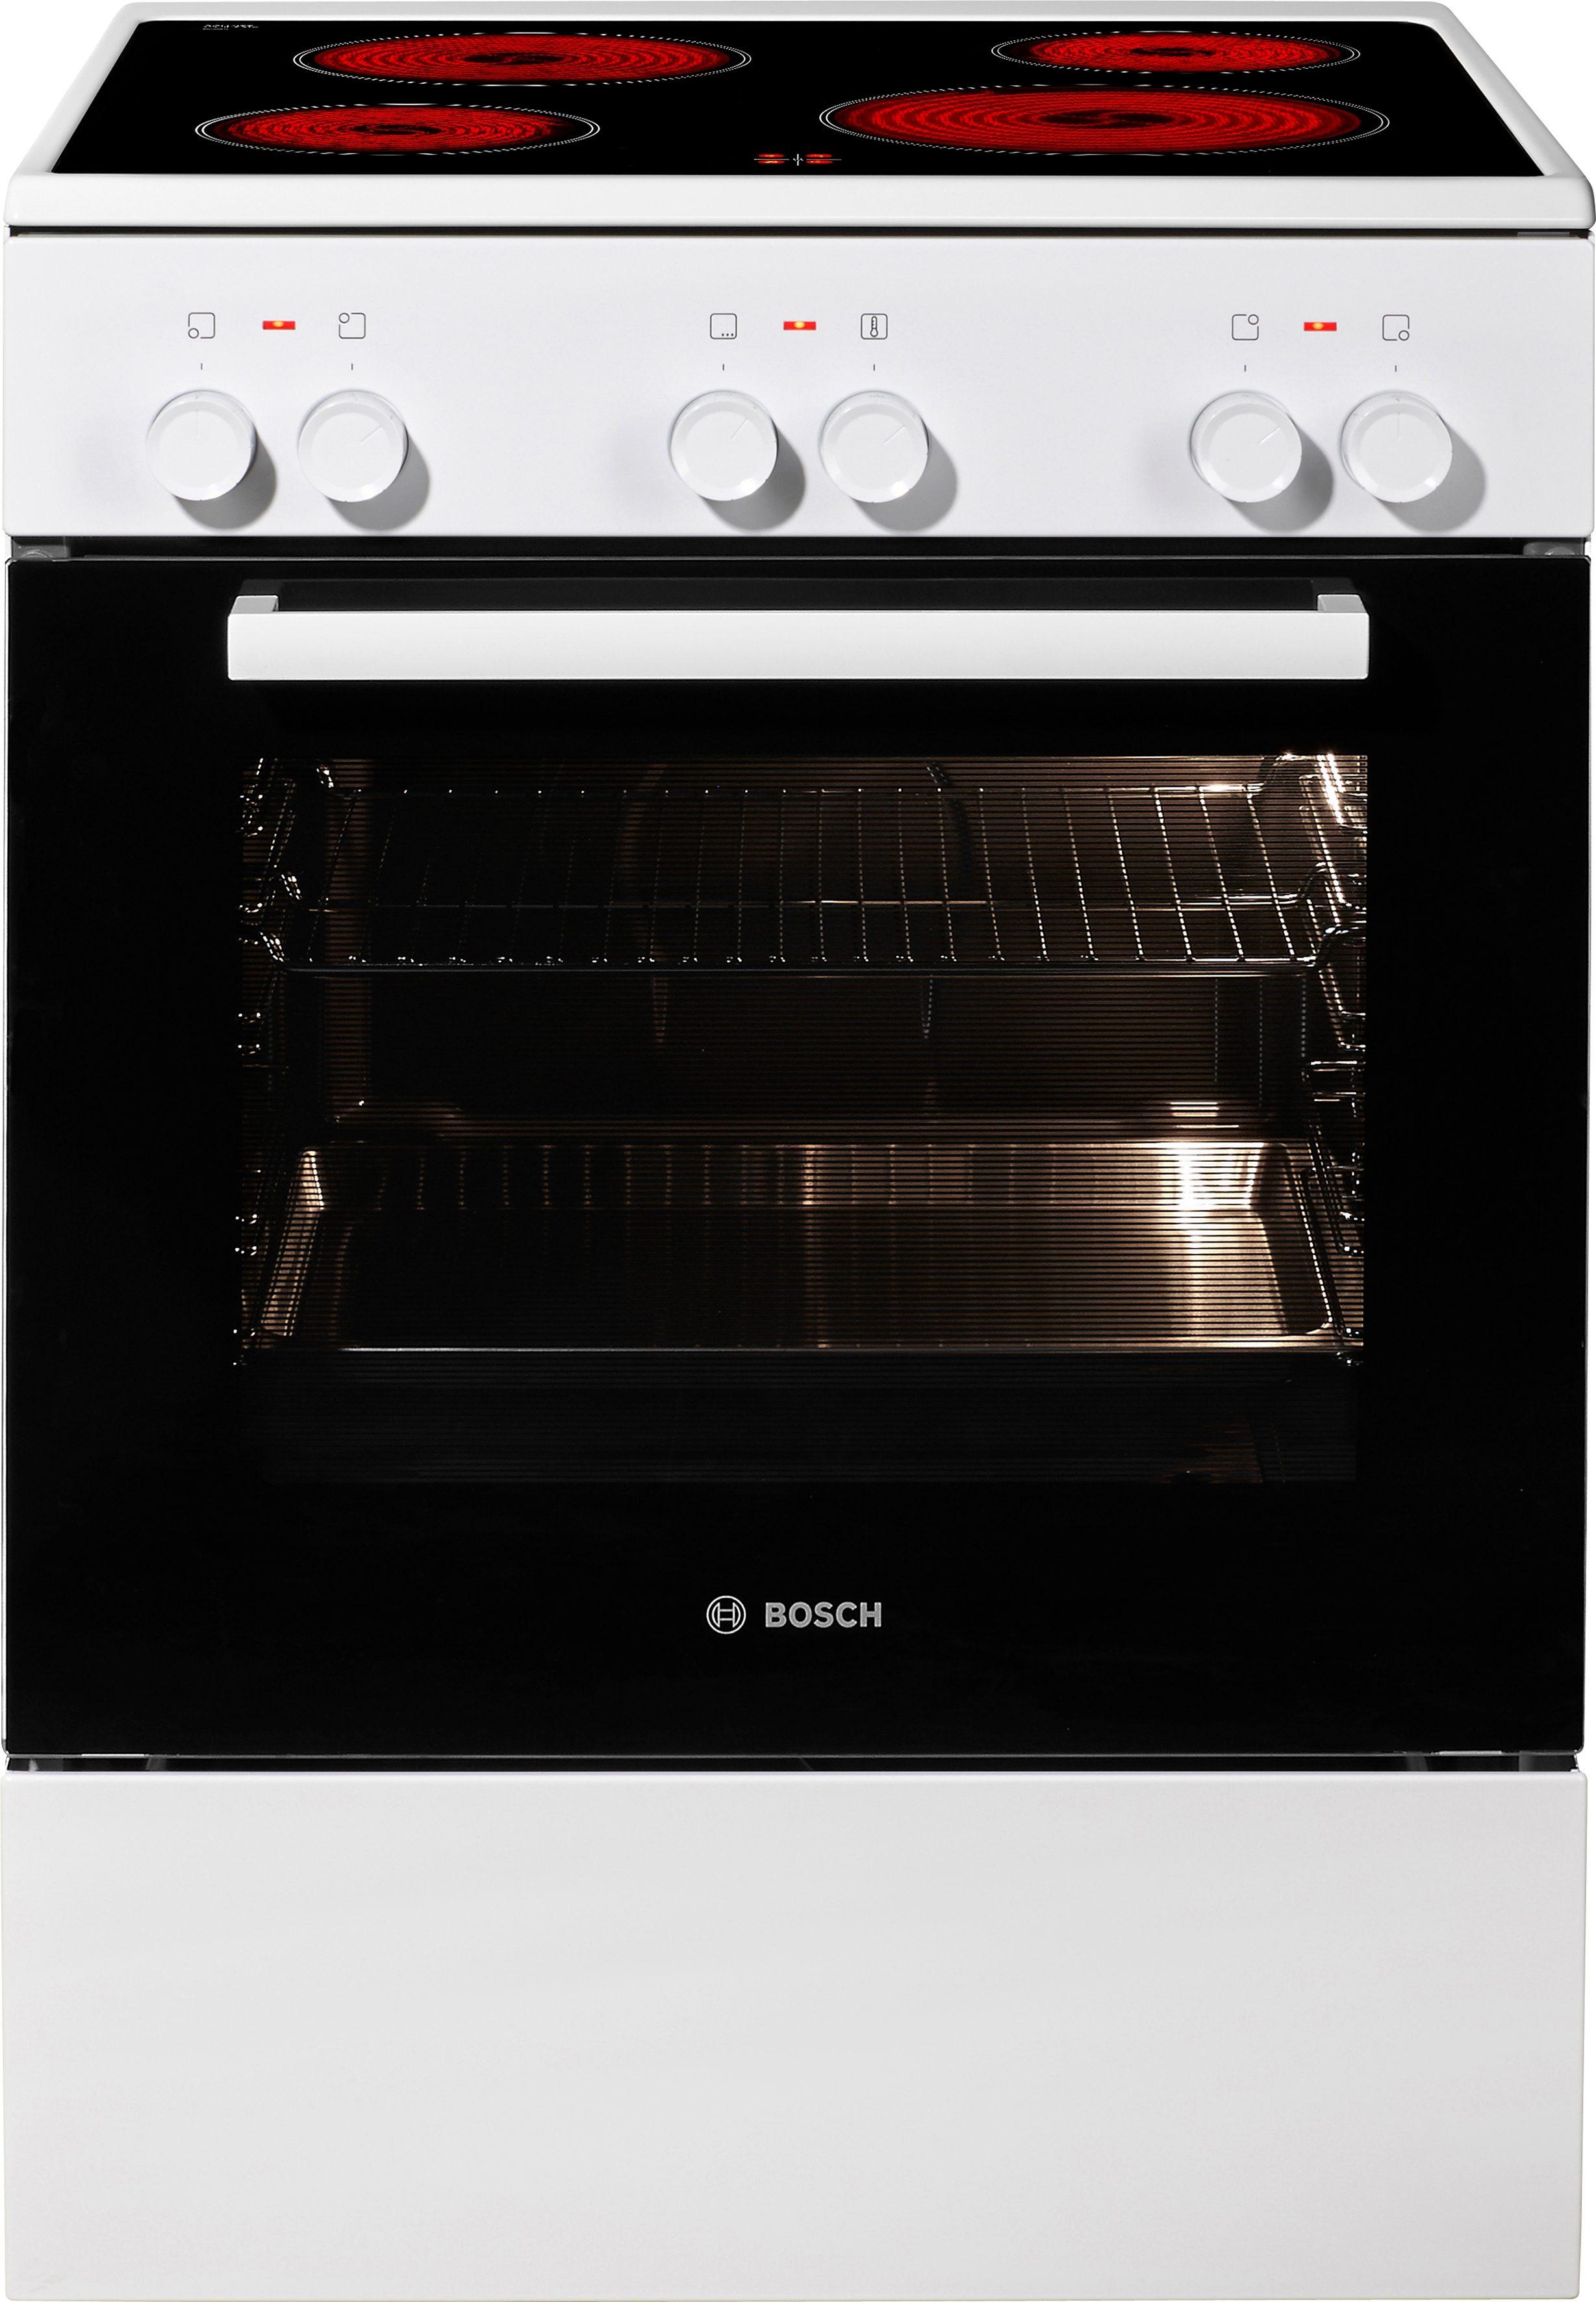 Bosch Standherd HCA422120, A, 60,0 cm breit